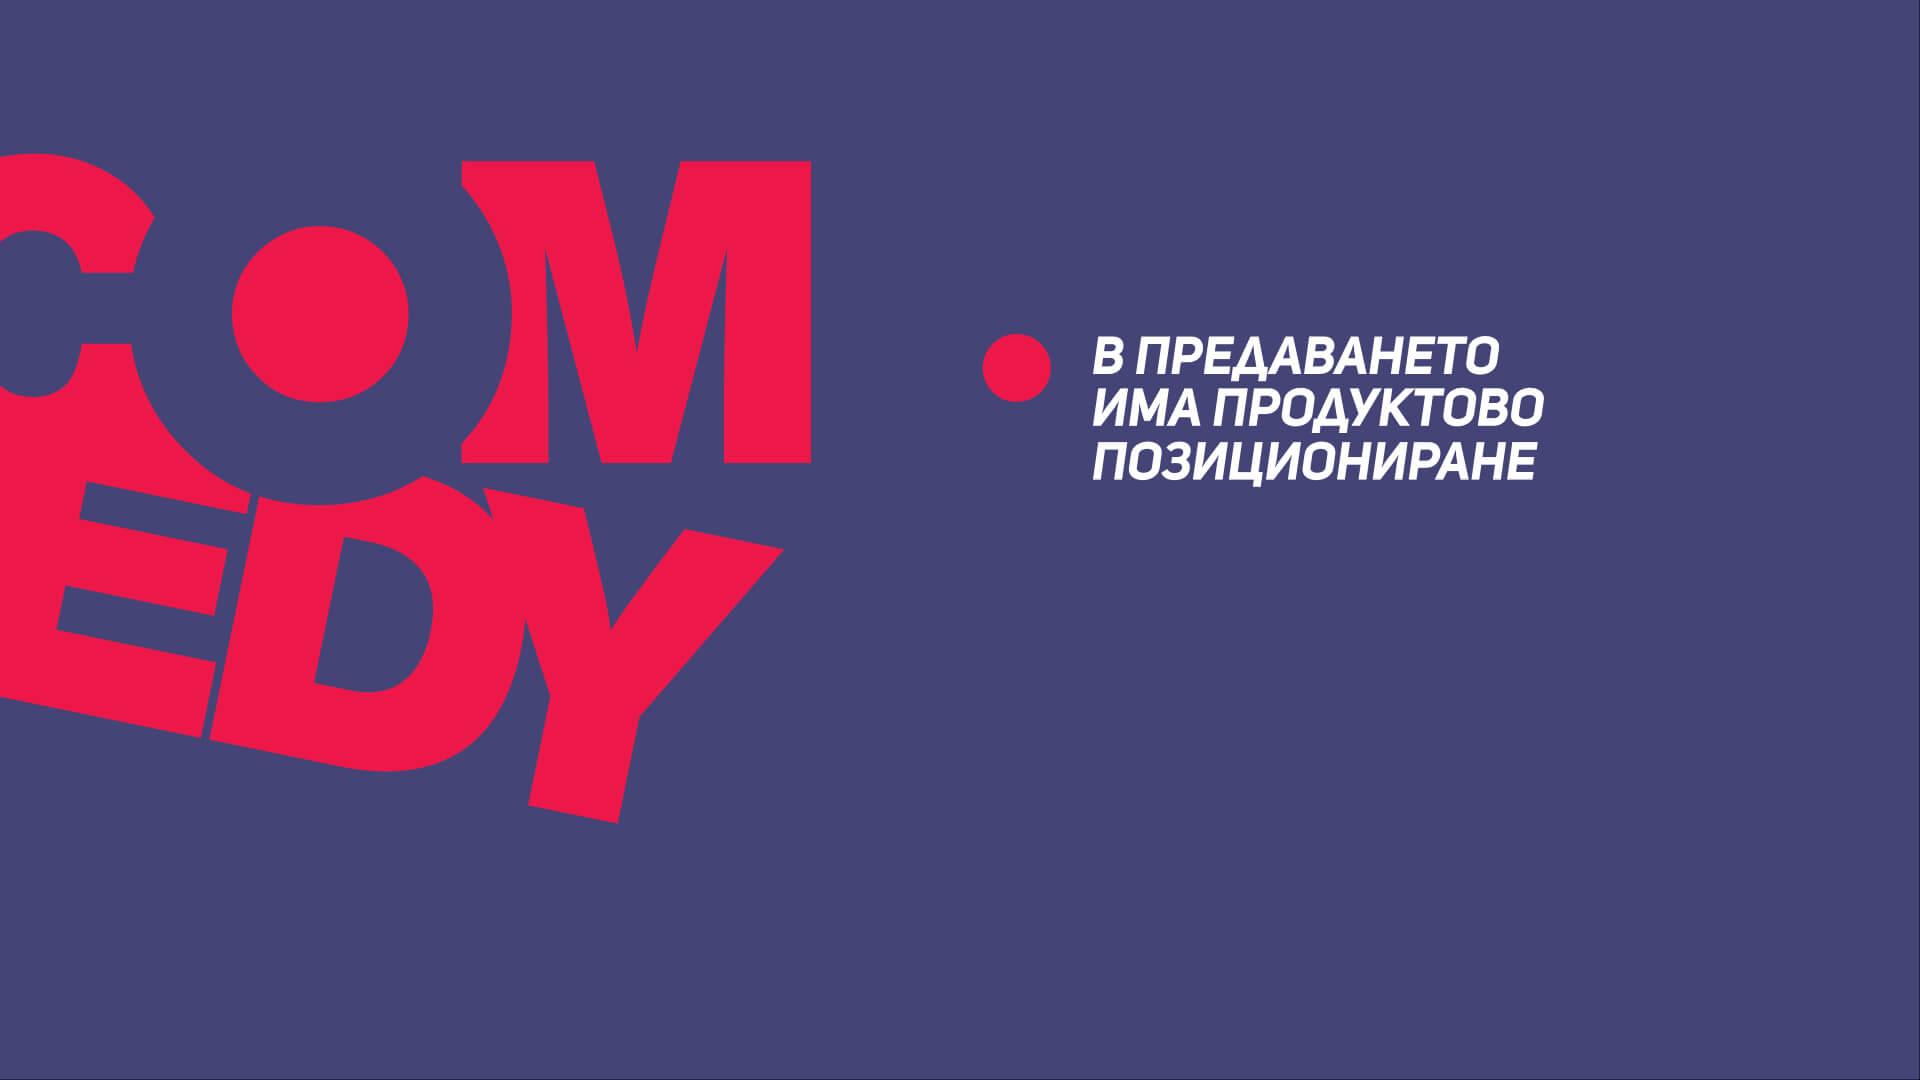 MAIN_PRODUKTOVO (0-00-01-24)